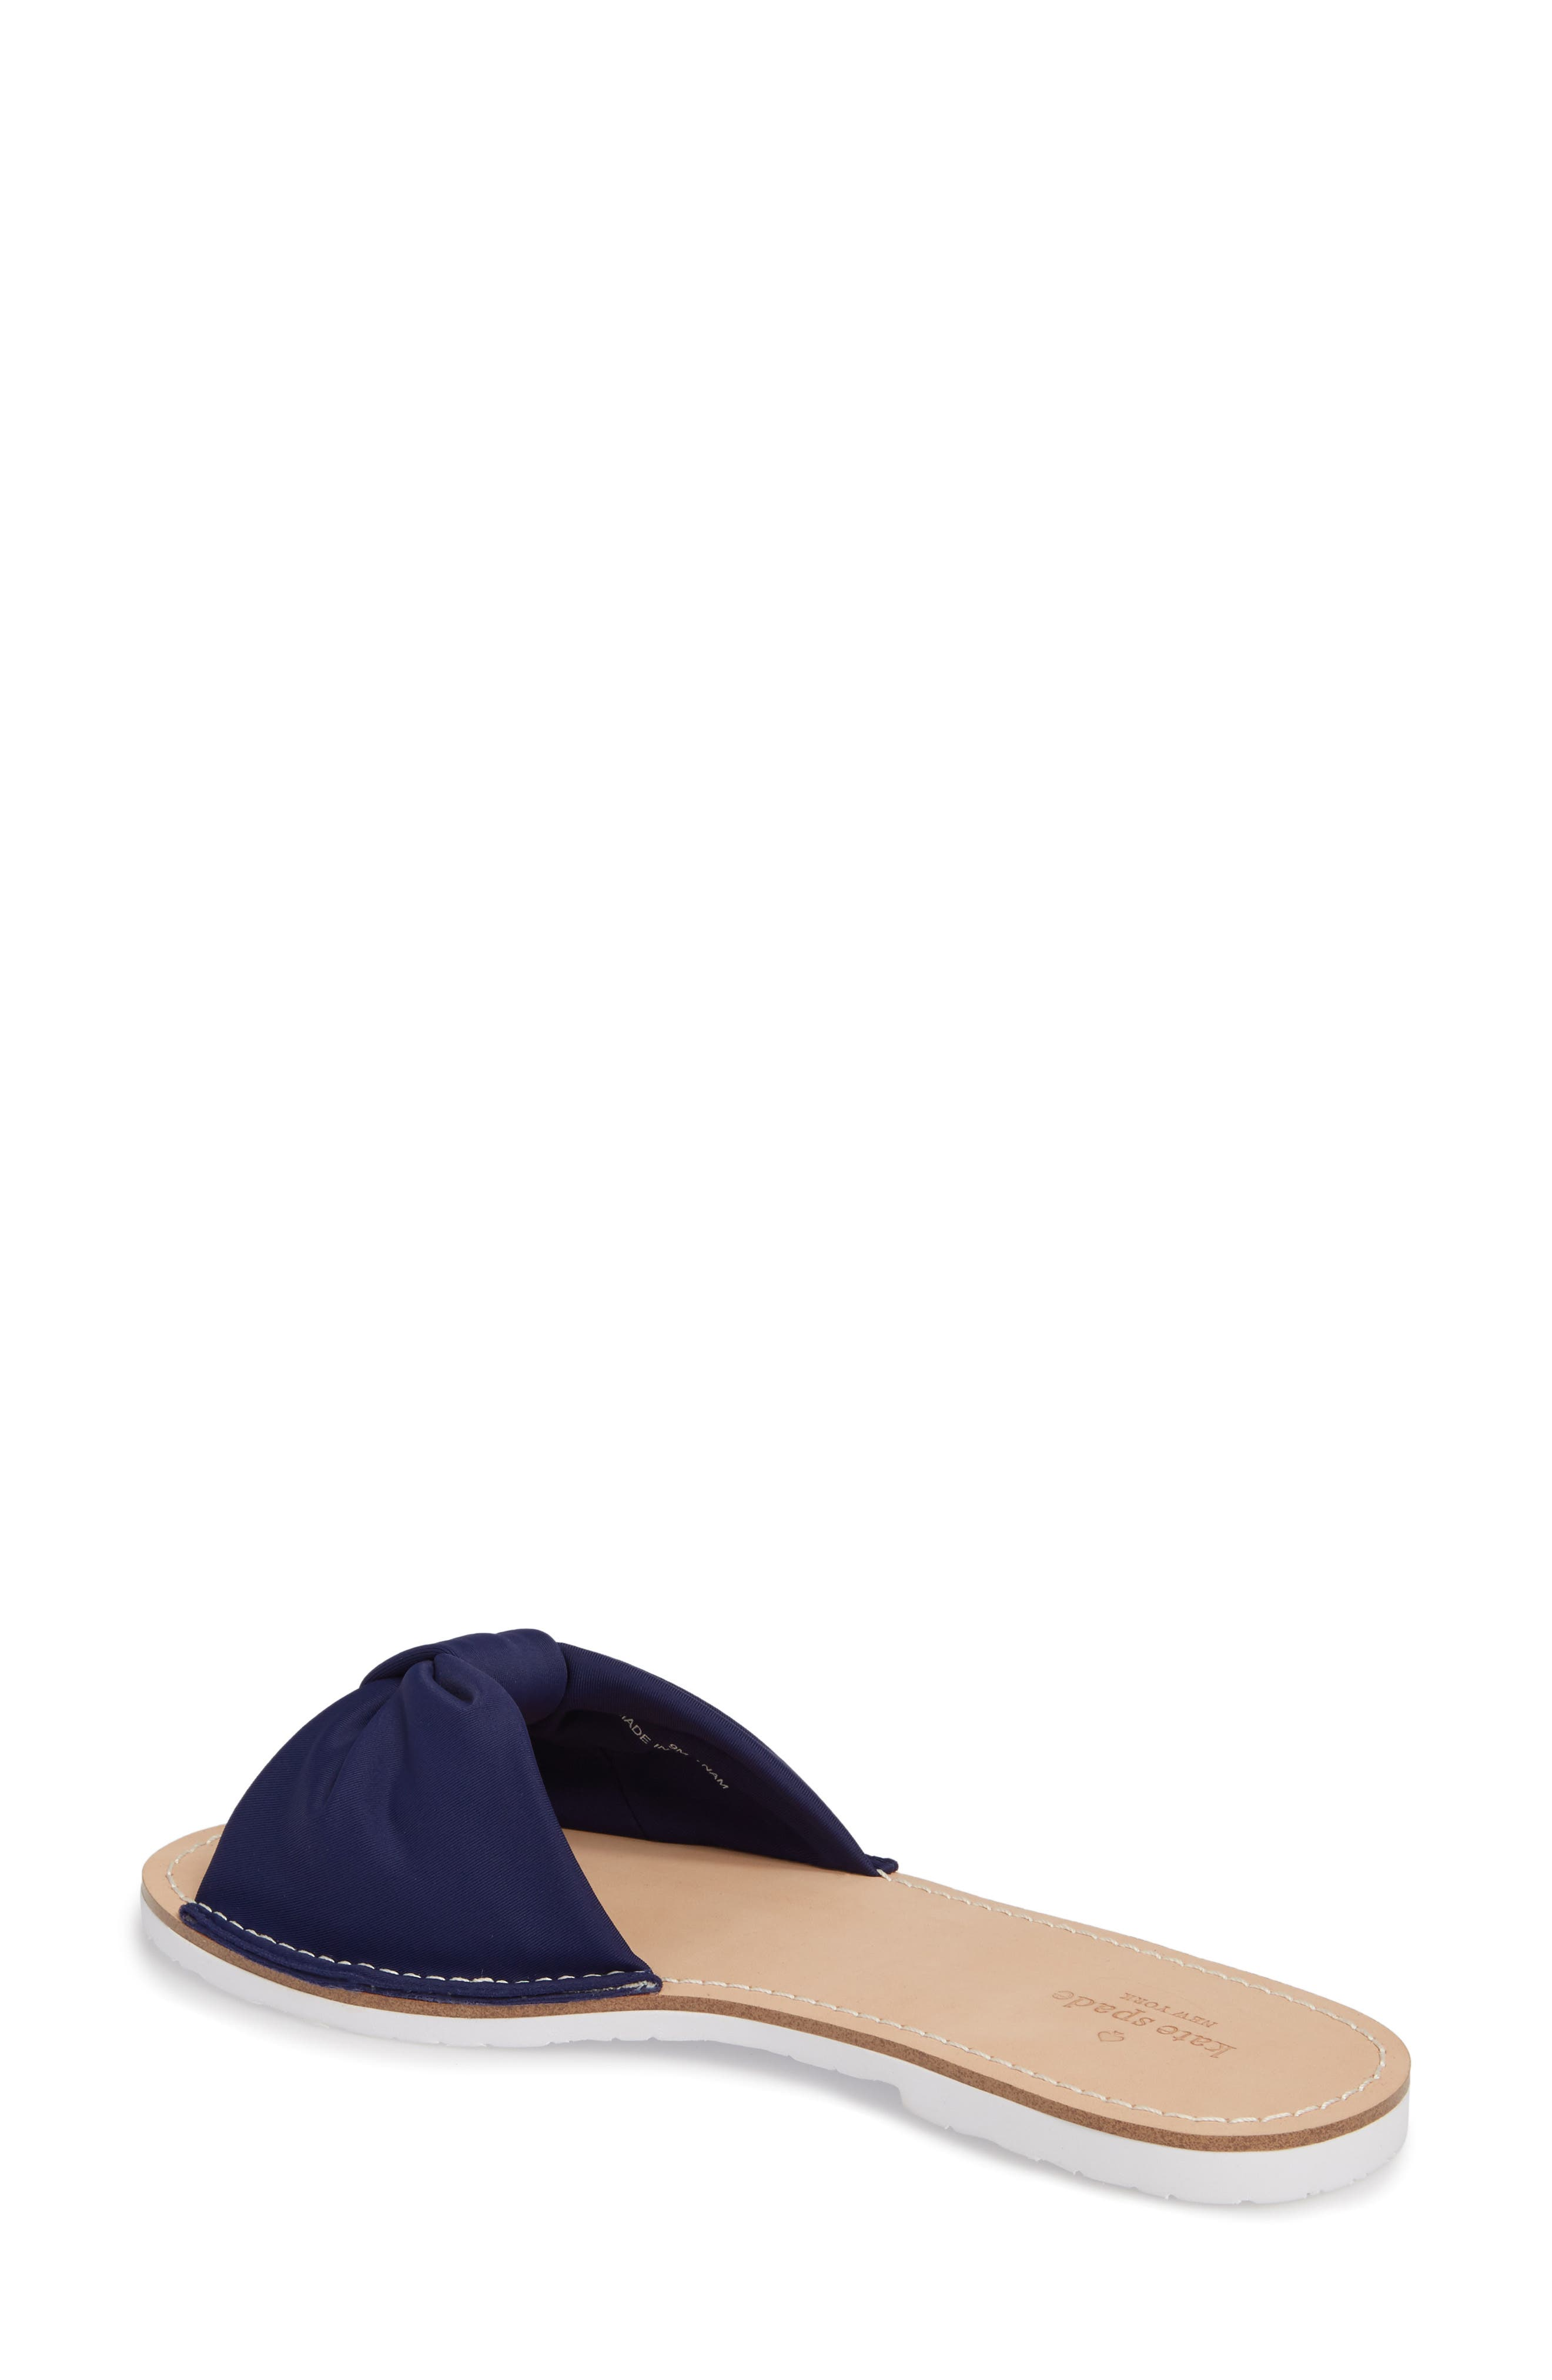 indi slide sandal,                             Alternate thumbnail 2, color,                             Blue